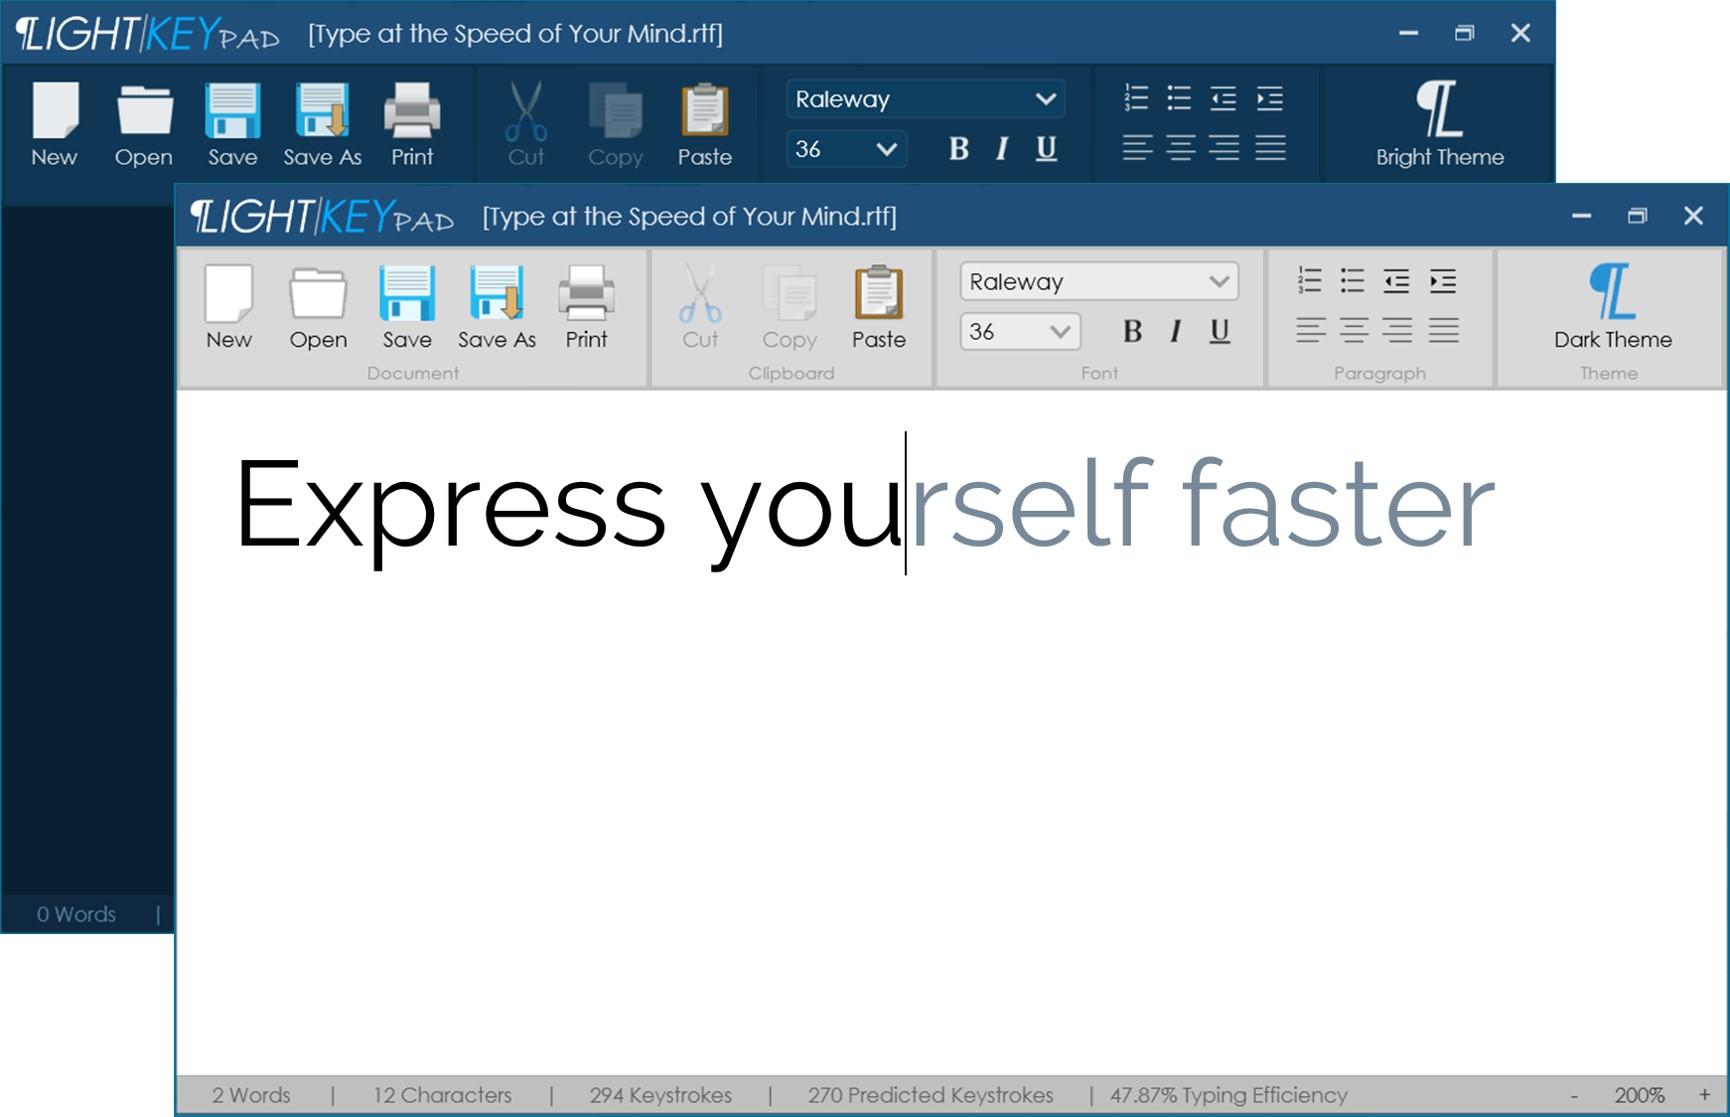 Lightkey Free Predictive Text Editor